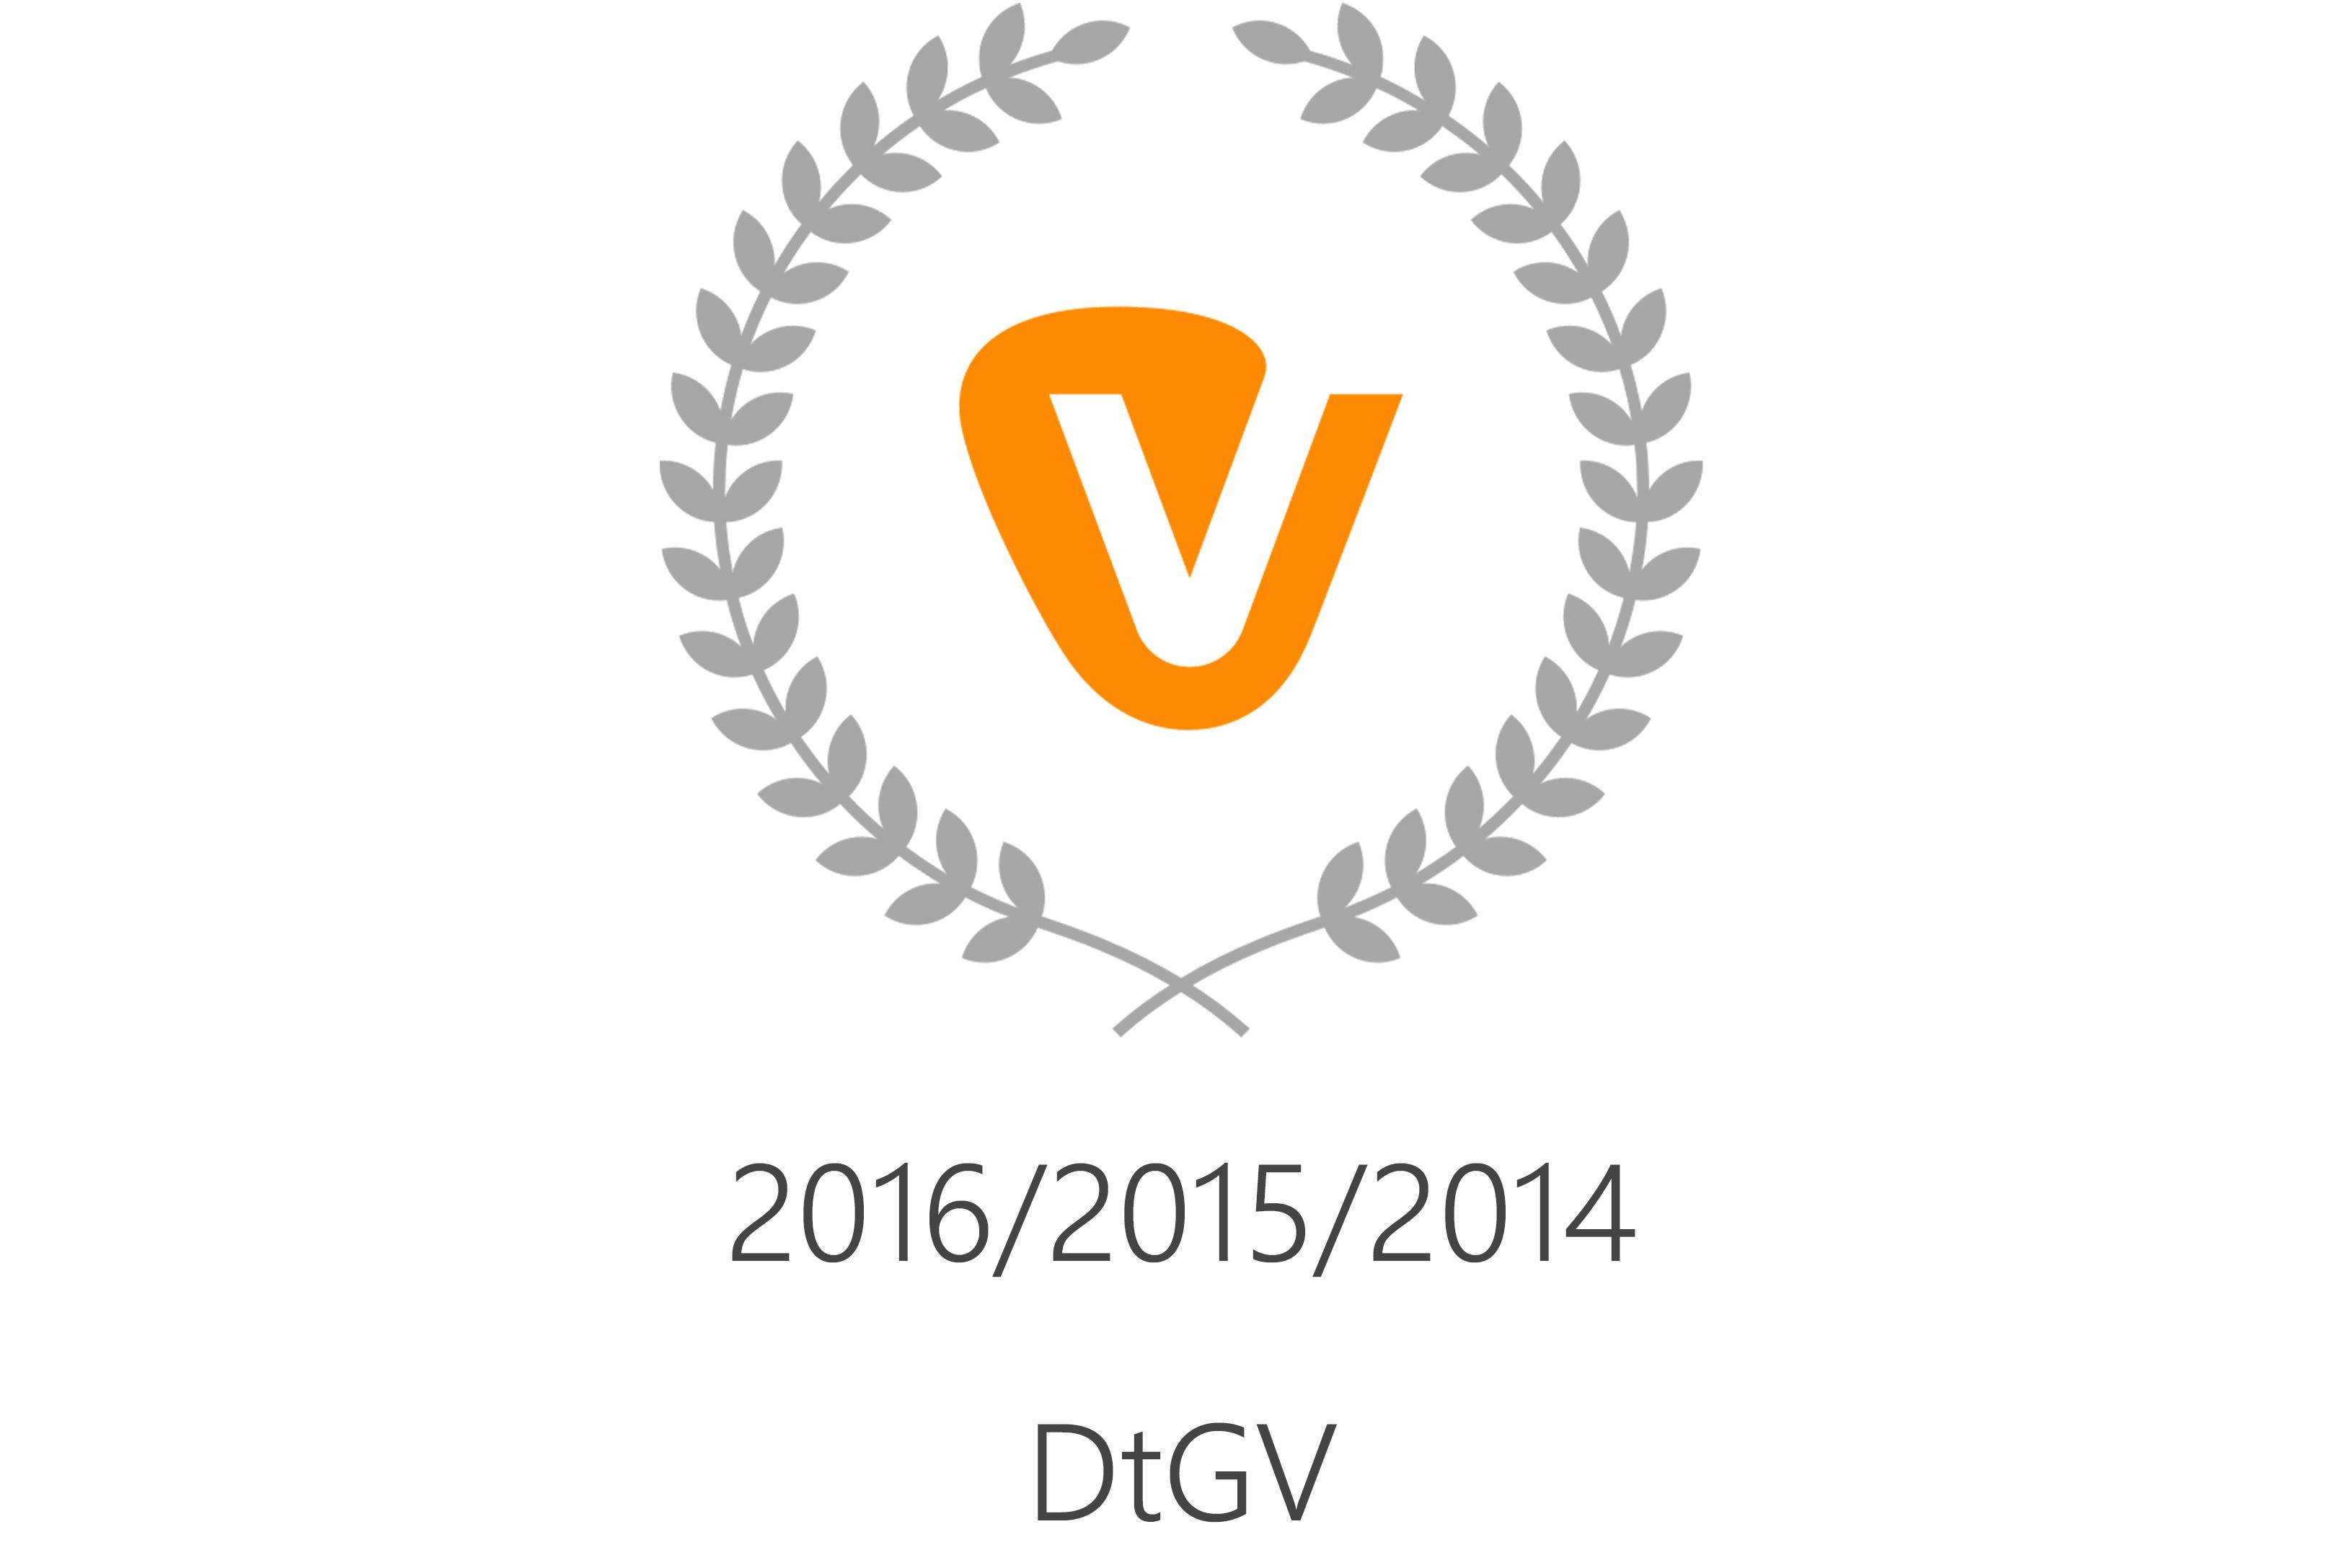 DtGV_2016-2015-2014